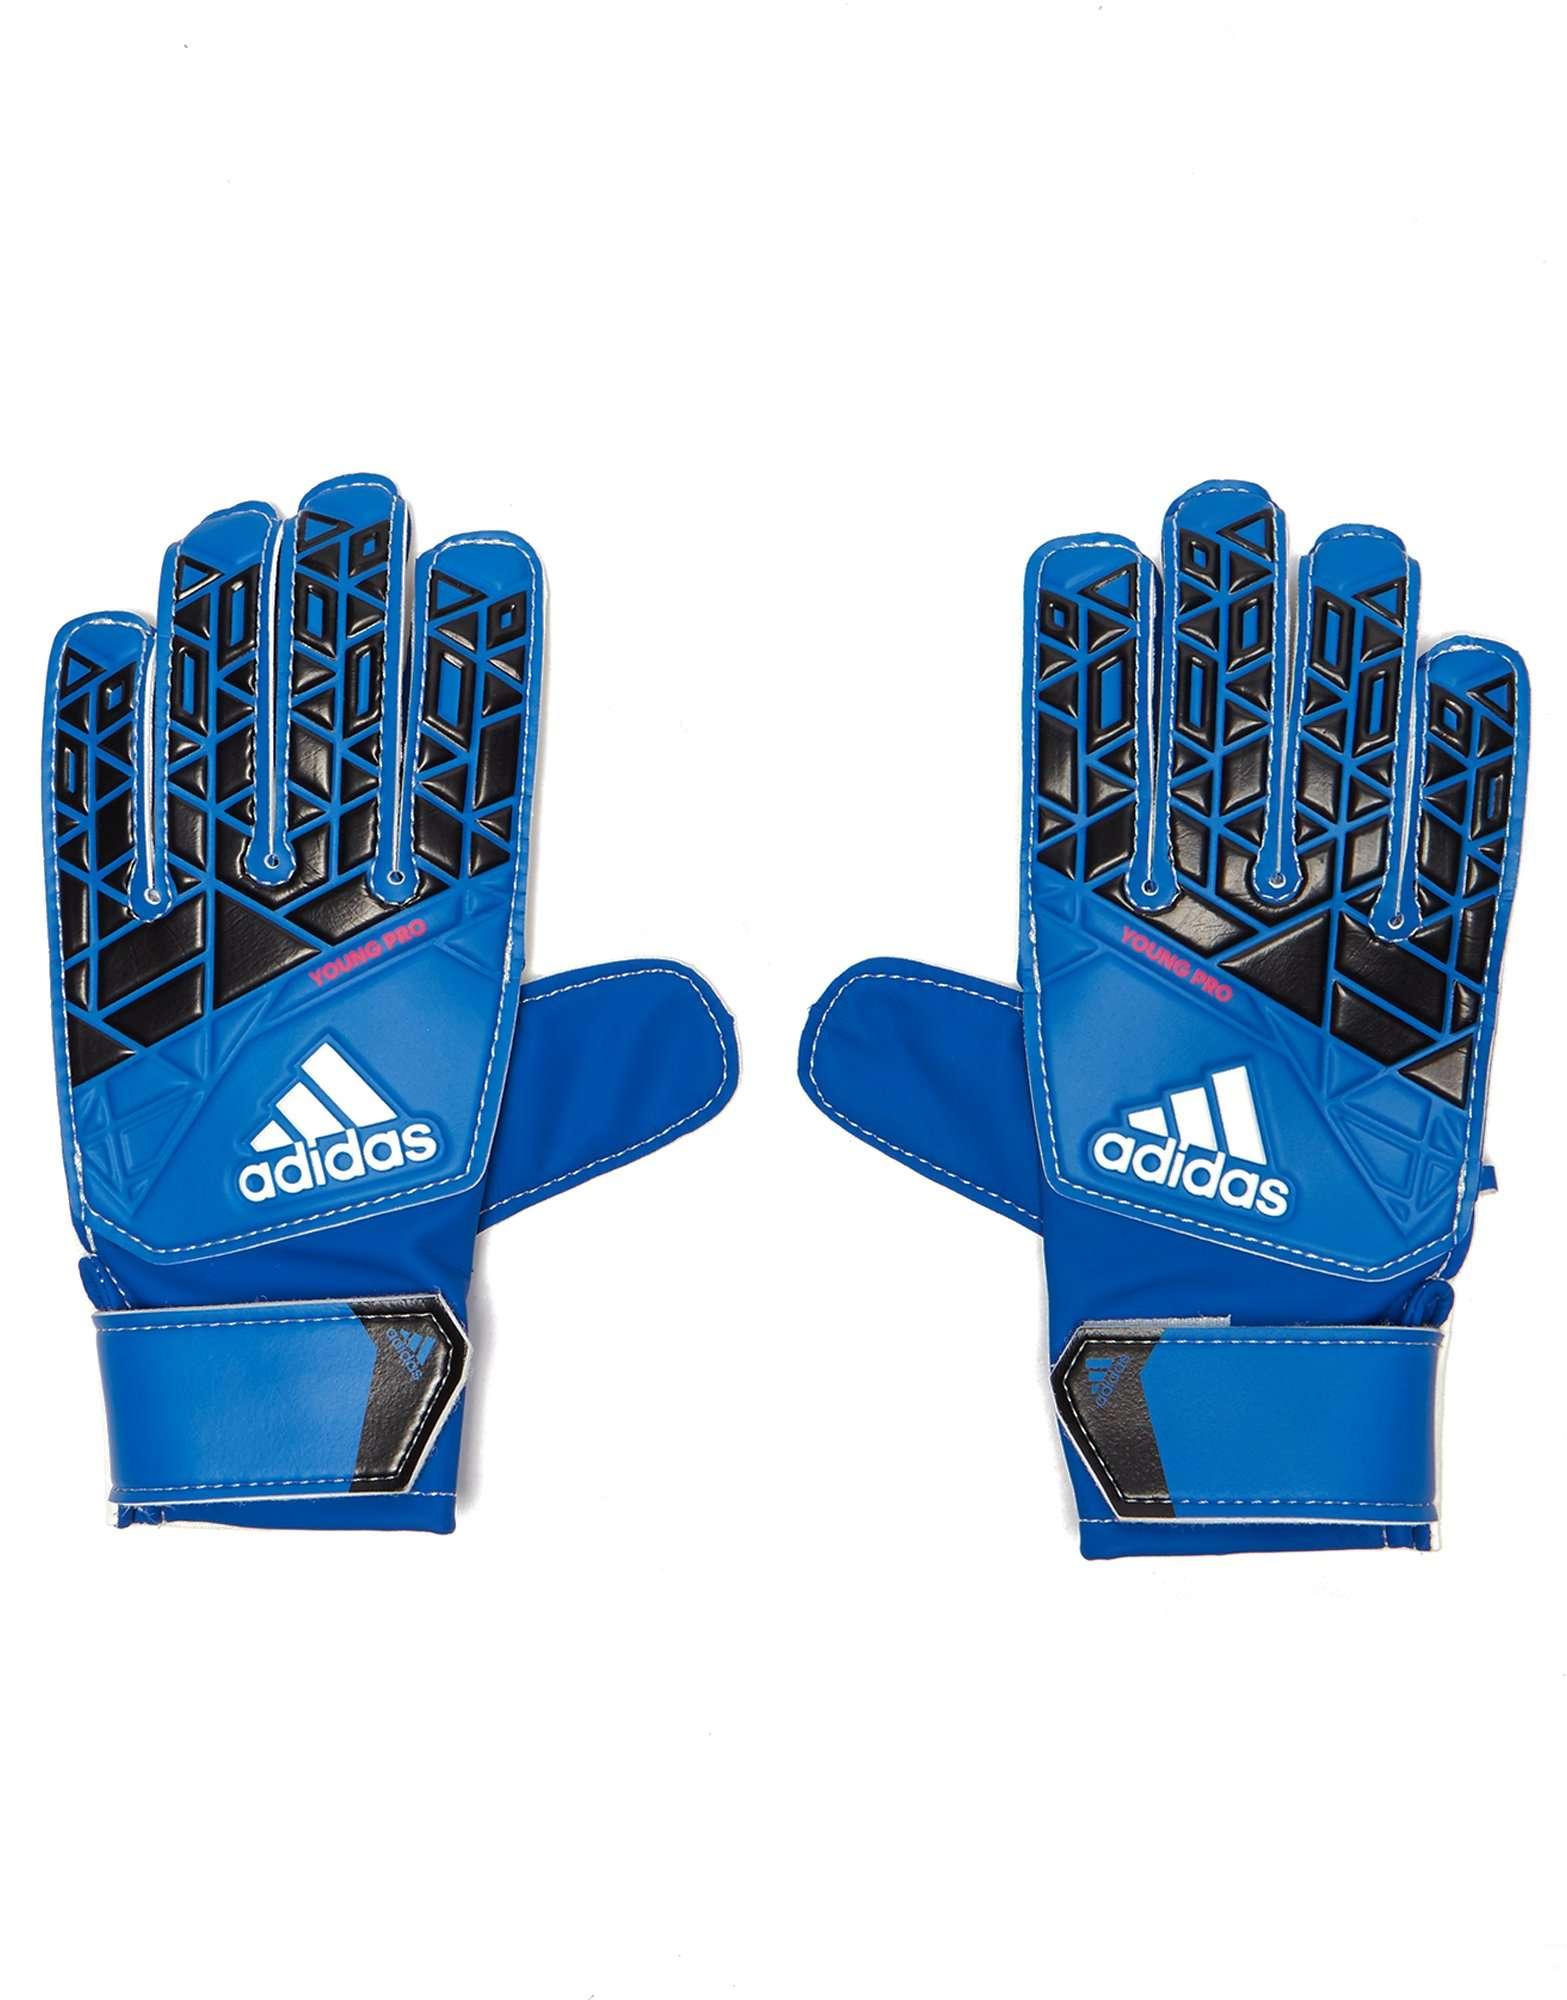 adidas Ace Pro Goalkeeper Handschoenen